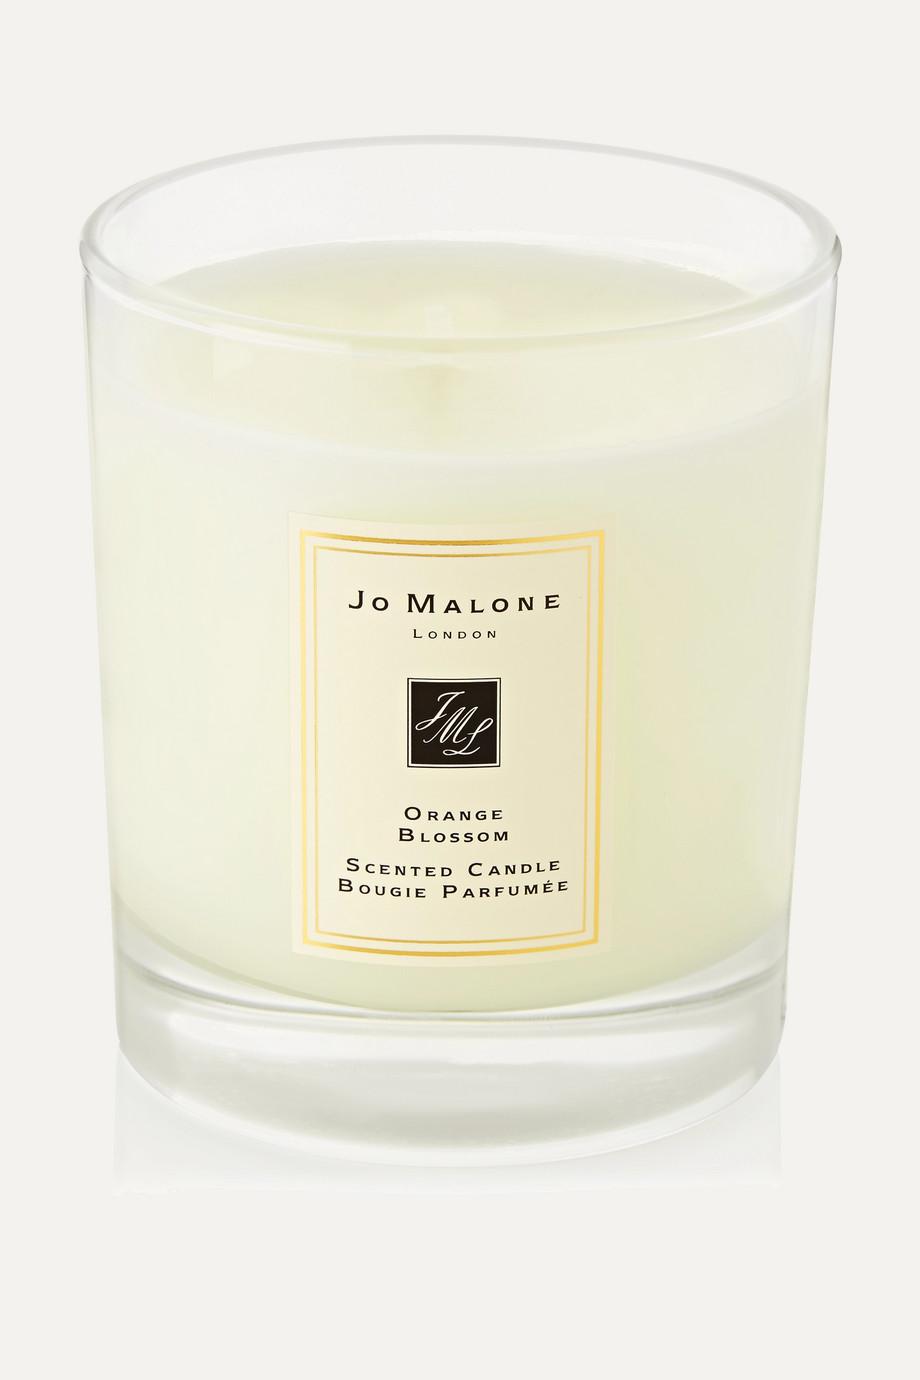 Jo Malone London Orange Blossom Scented Home Candle, 200g